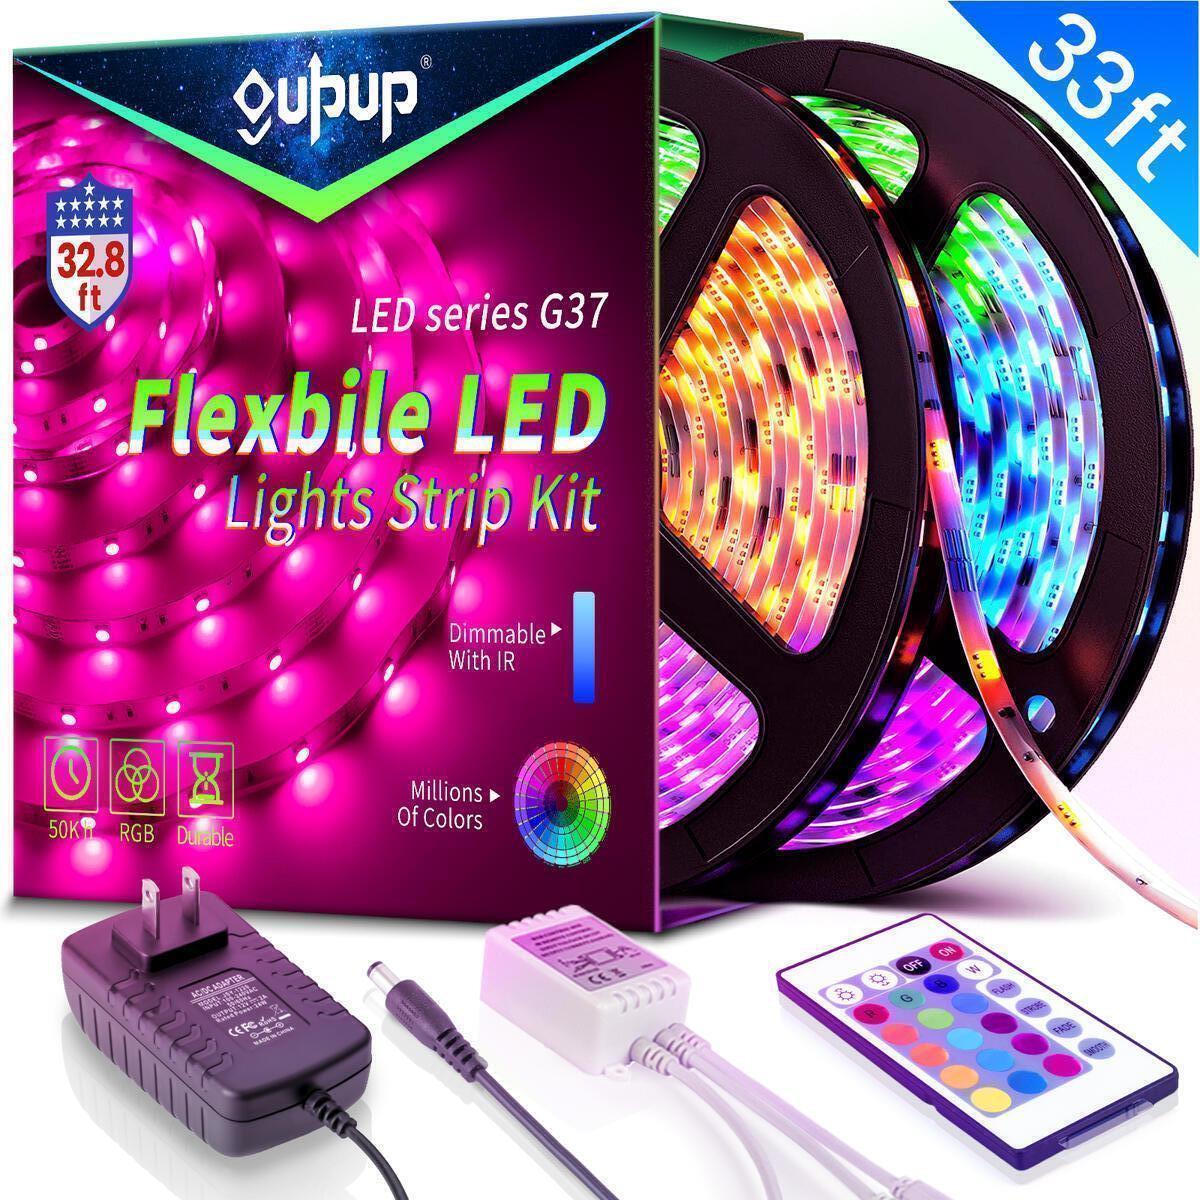 33FT LED Strip Lights, Led Lights Strip with IR Remote Color Changing Led Lights RGB SMD5050 Tape Lights Flexible Rope Lights Led Lights for Bedroom, Kitchen, Party Decoration(2x16.4ft)